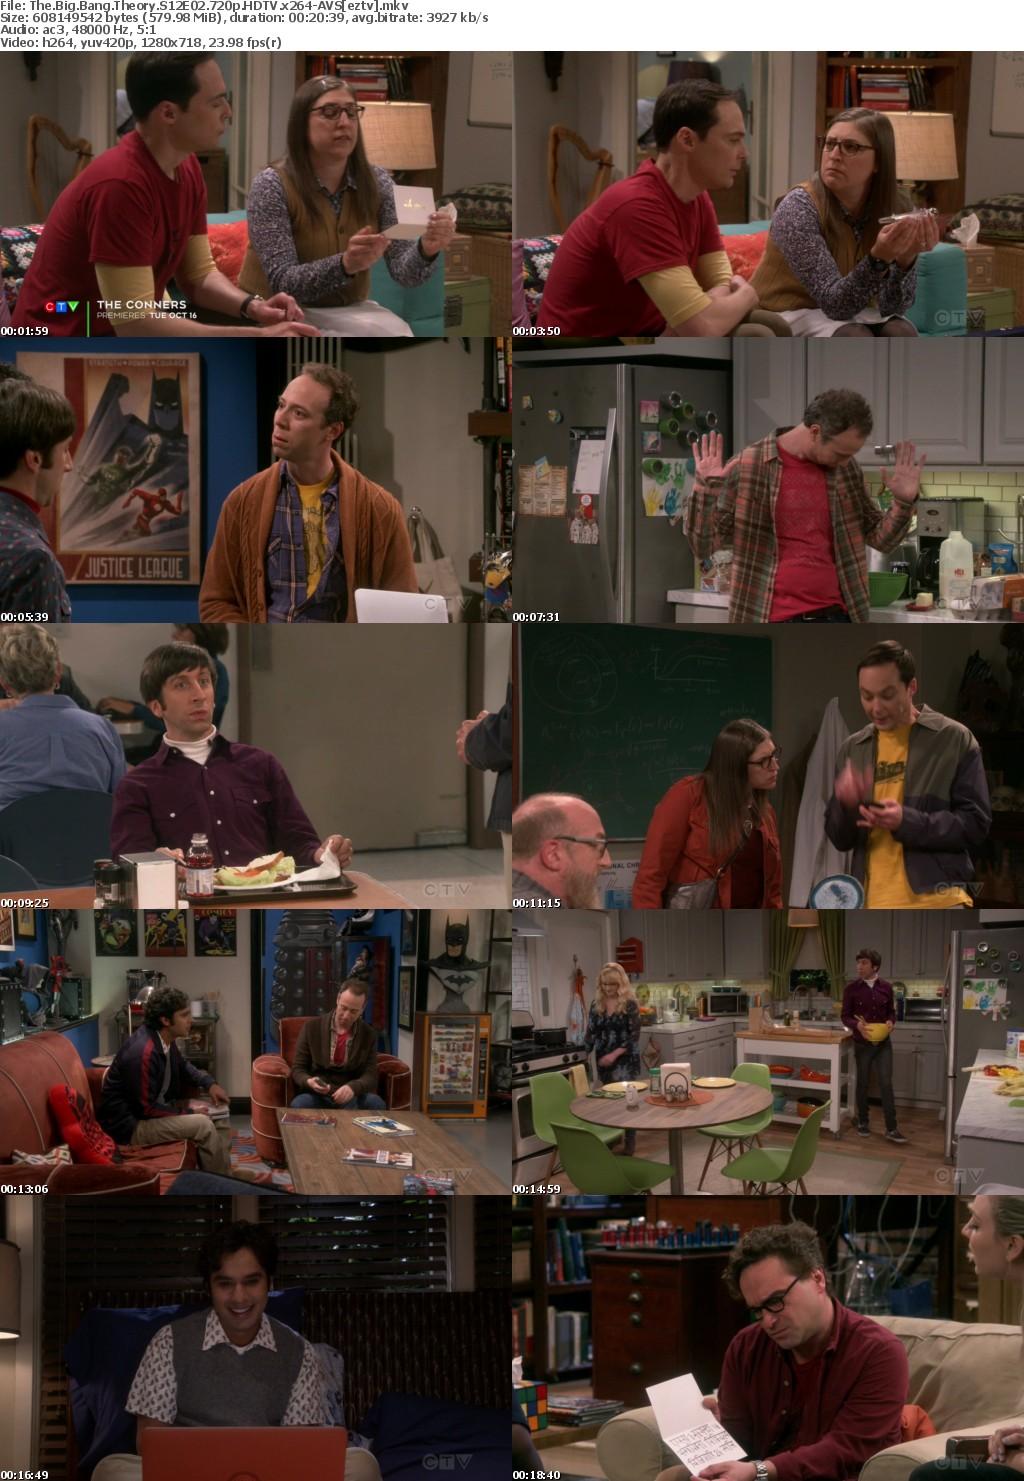 The Big Bang Theory S12E02 720p HDTV x264-AVS